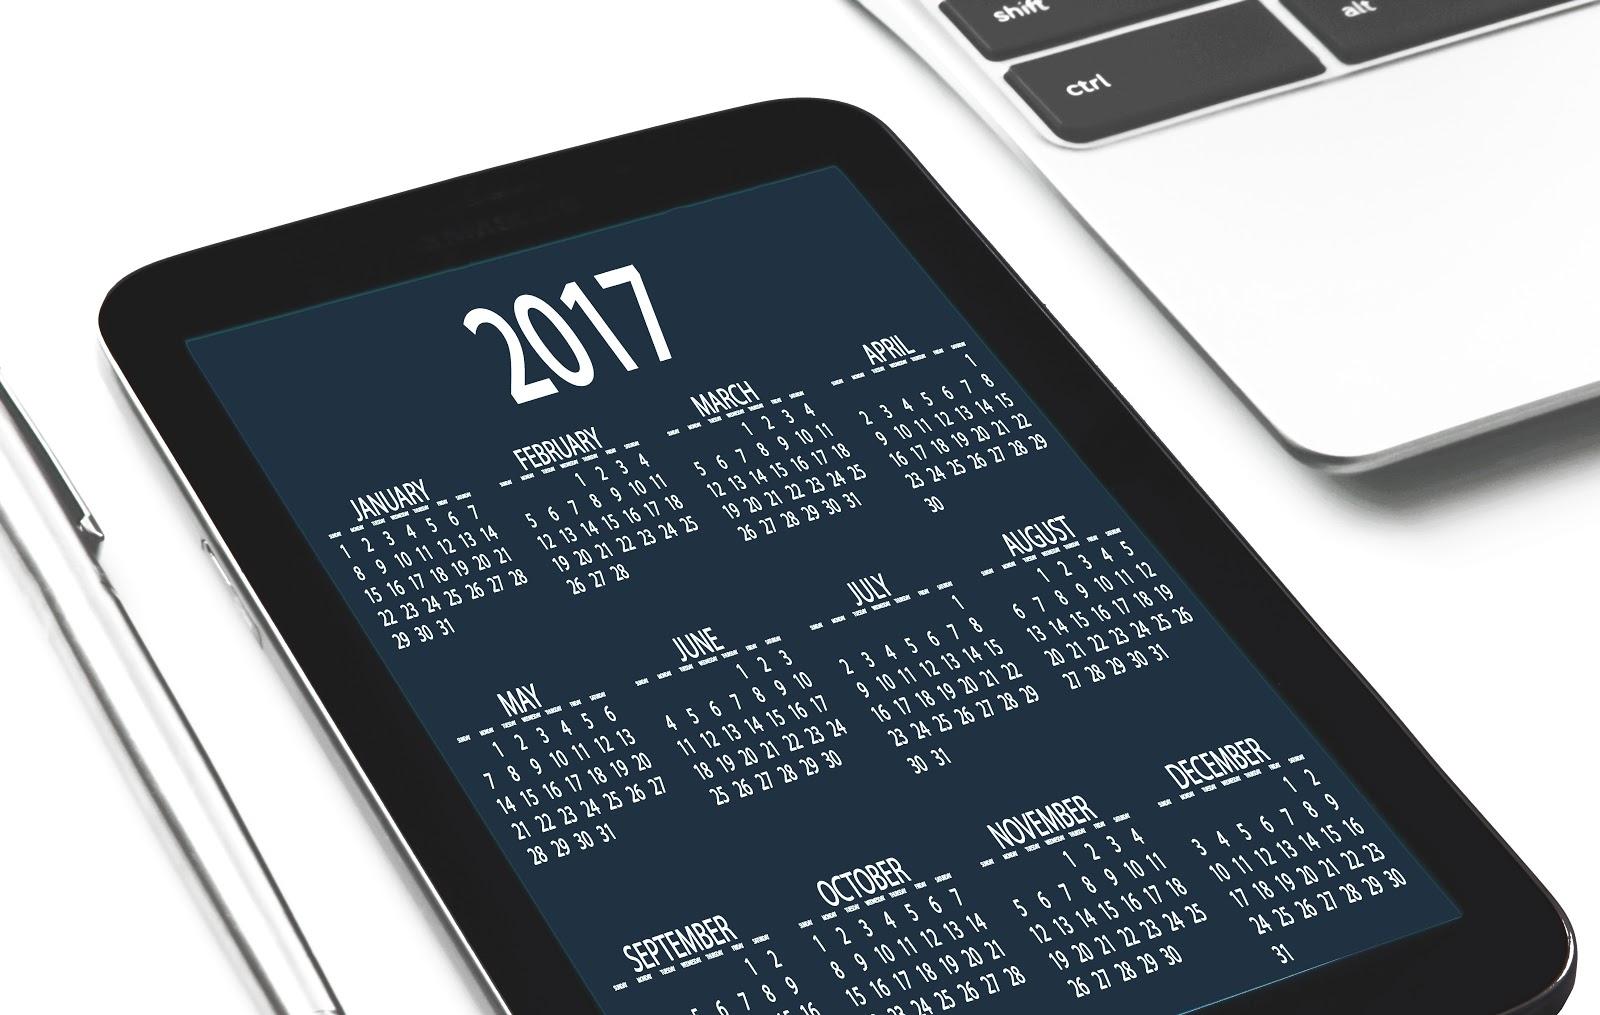 2017 year calendar on tablet screen